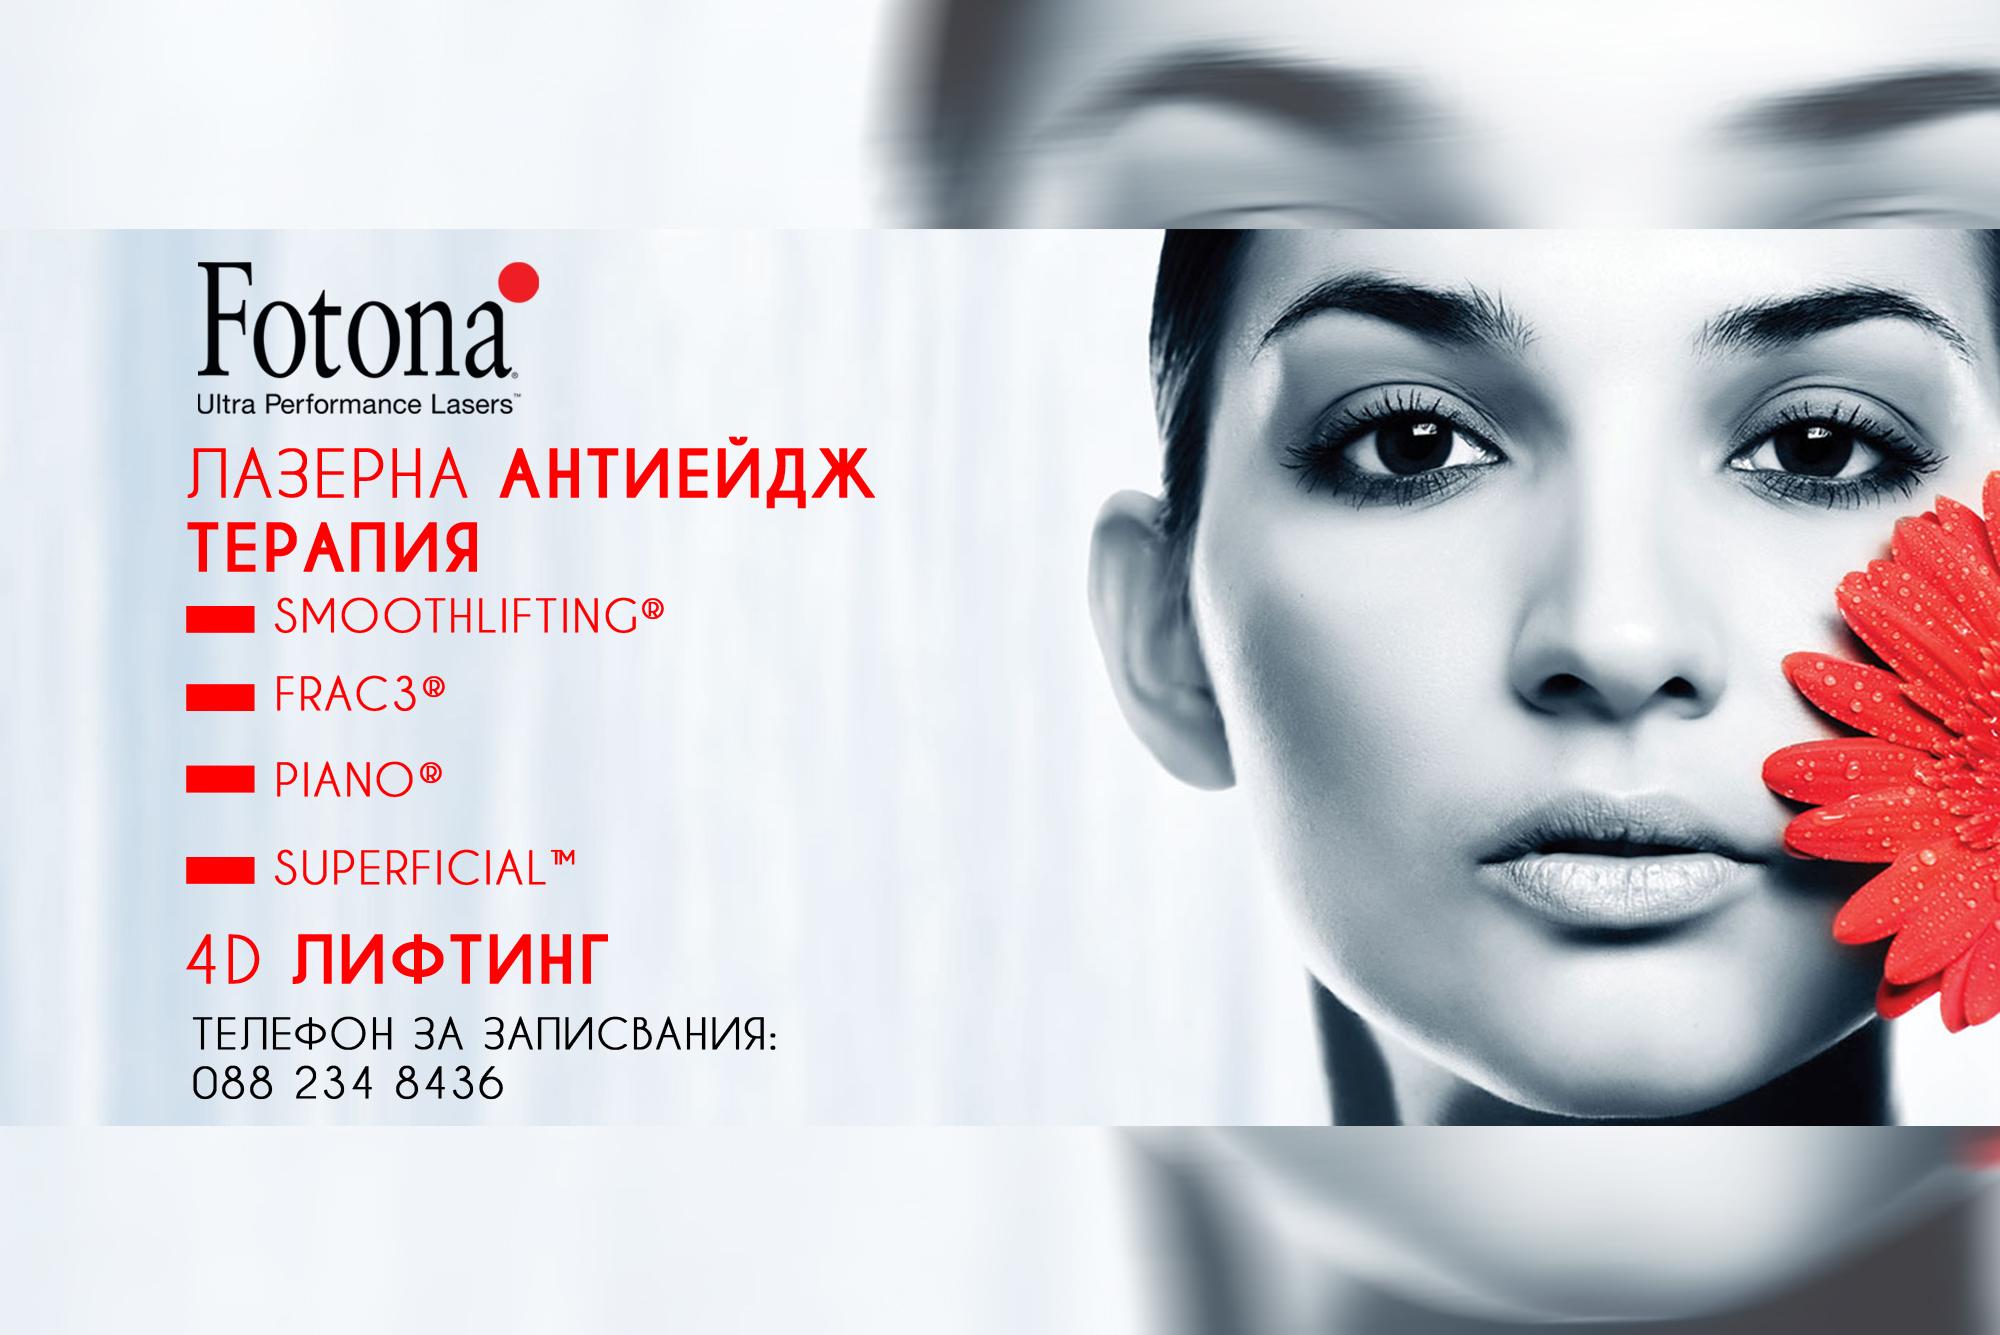 Клинична дерматология Fotona